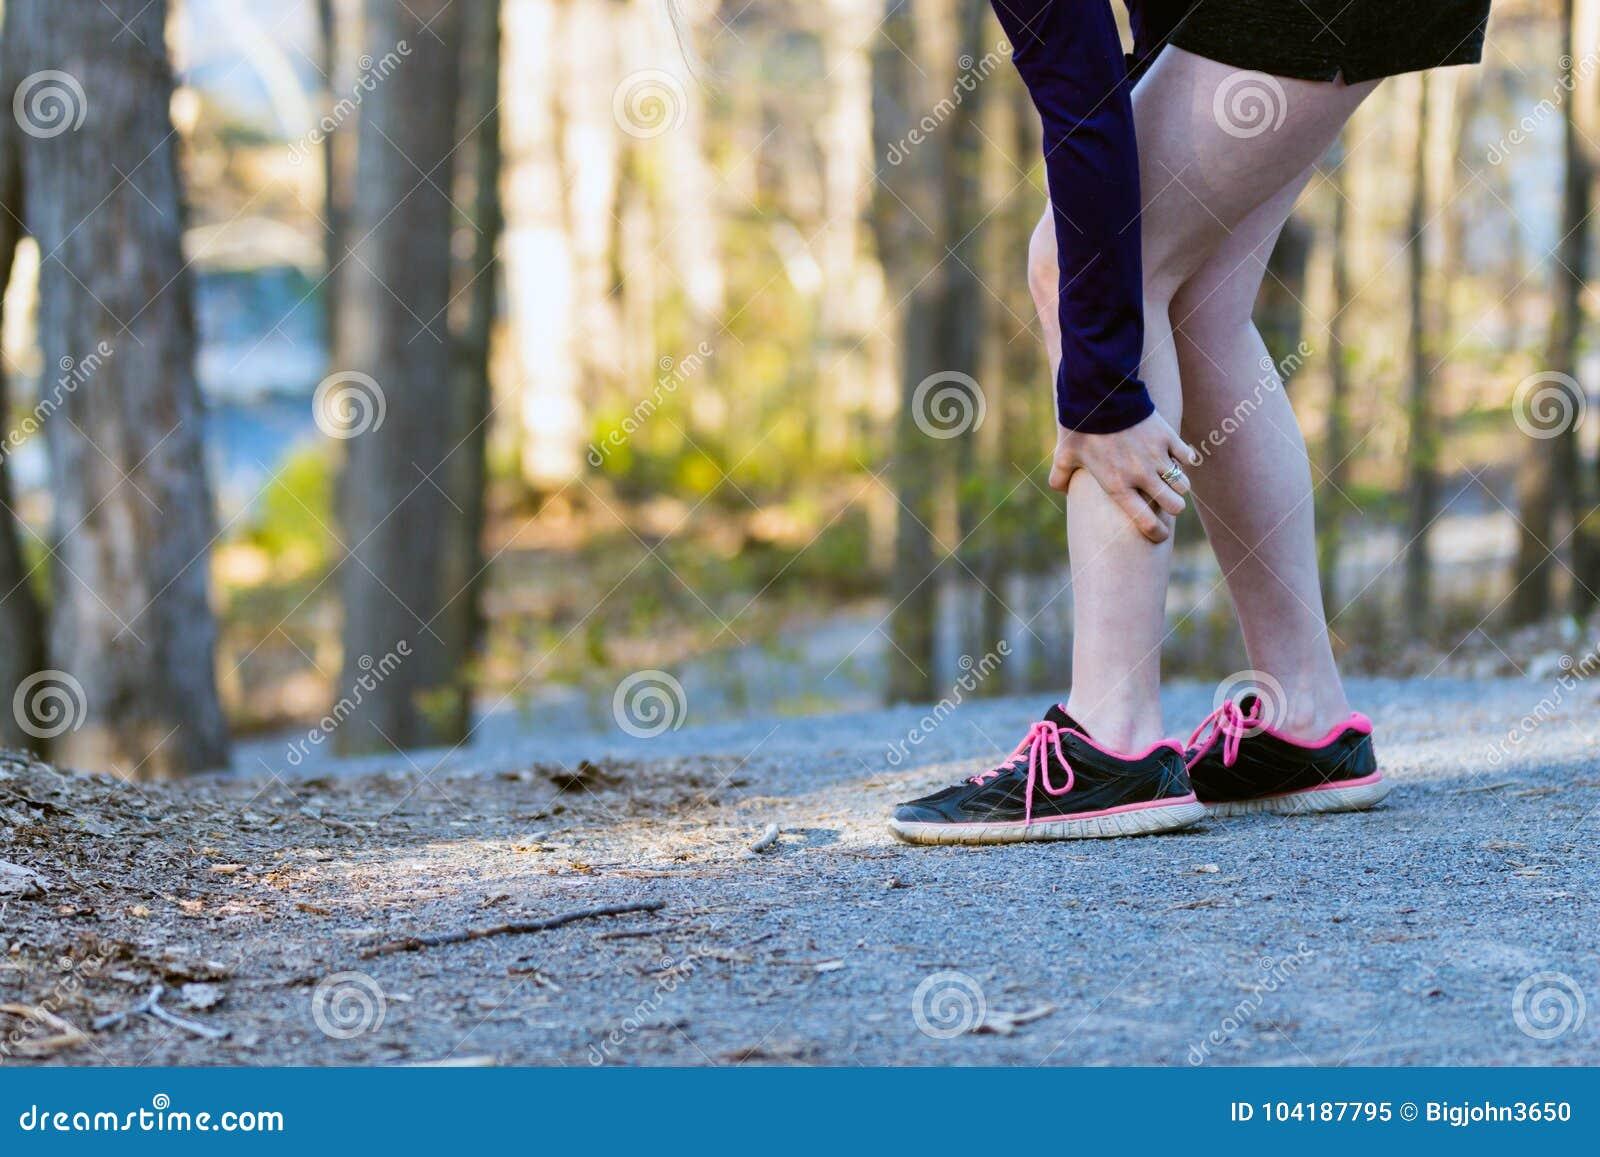 1879e3916dd1 Sports Injury Leg Cramp On Running Trail. Stock Image - Image of ...